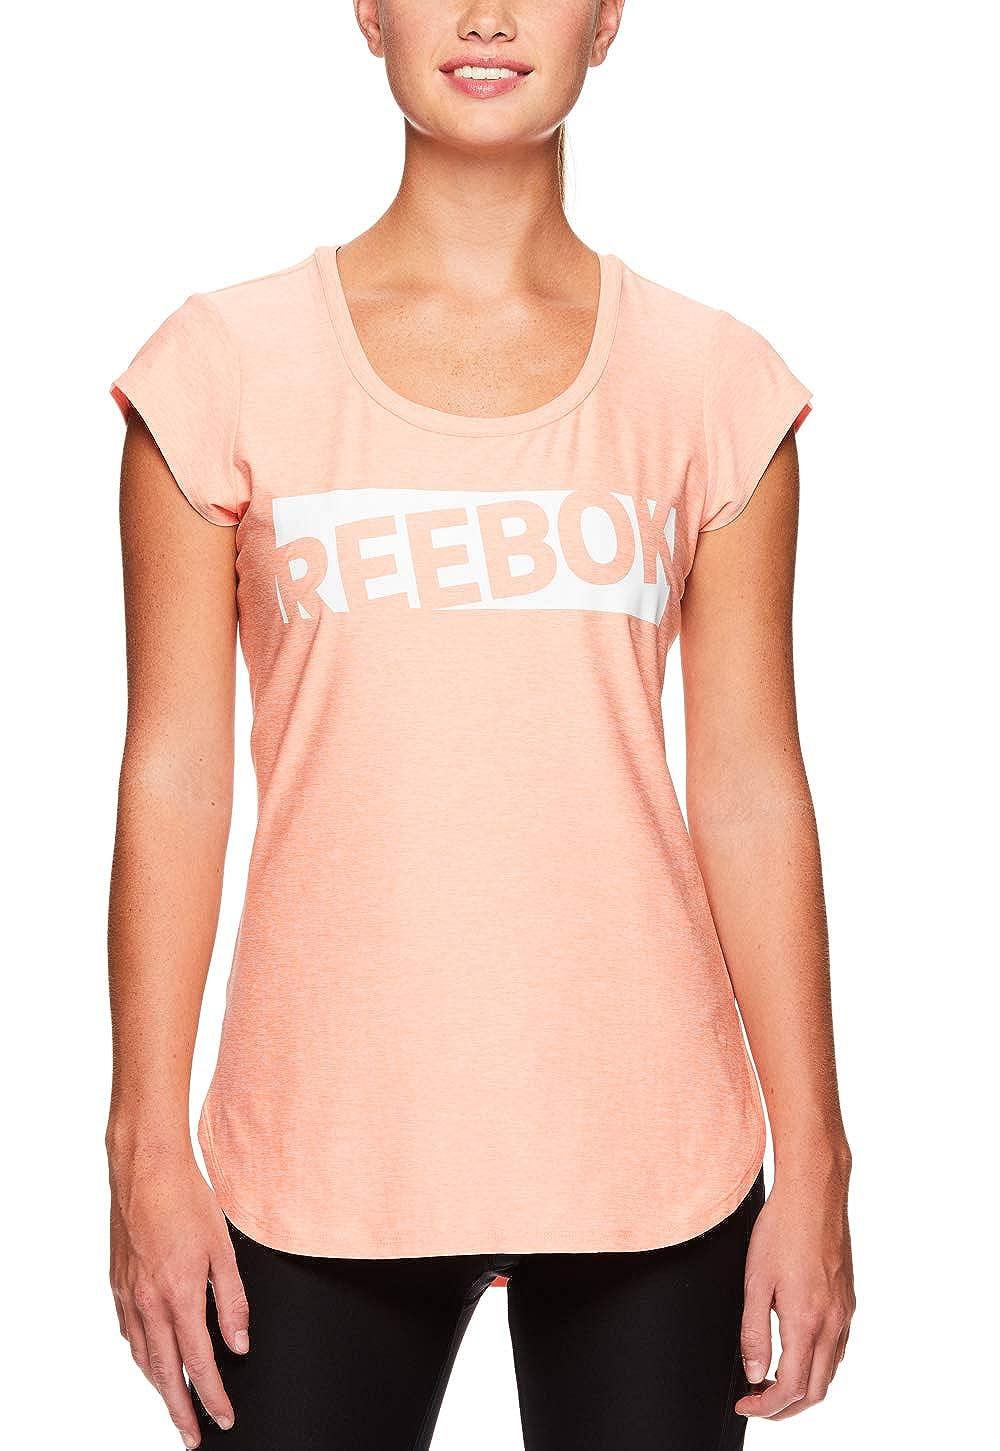 0b6cbc077b1ba Amazon.com  Reebok Women s Legend Performance Short Sleeve T-Shirt with  Polyspan Fabric  Clothing